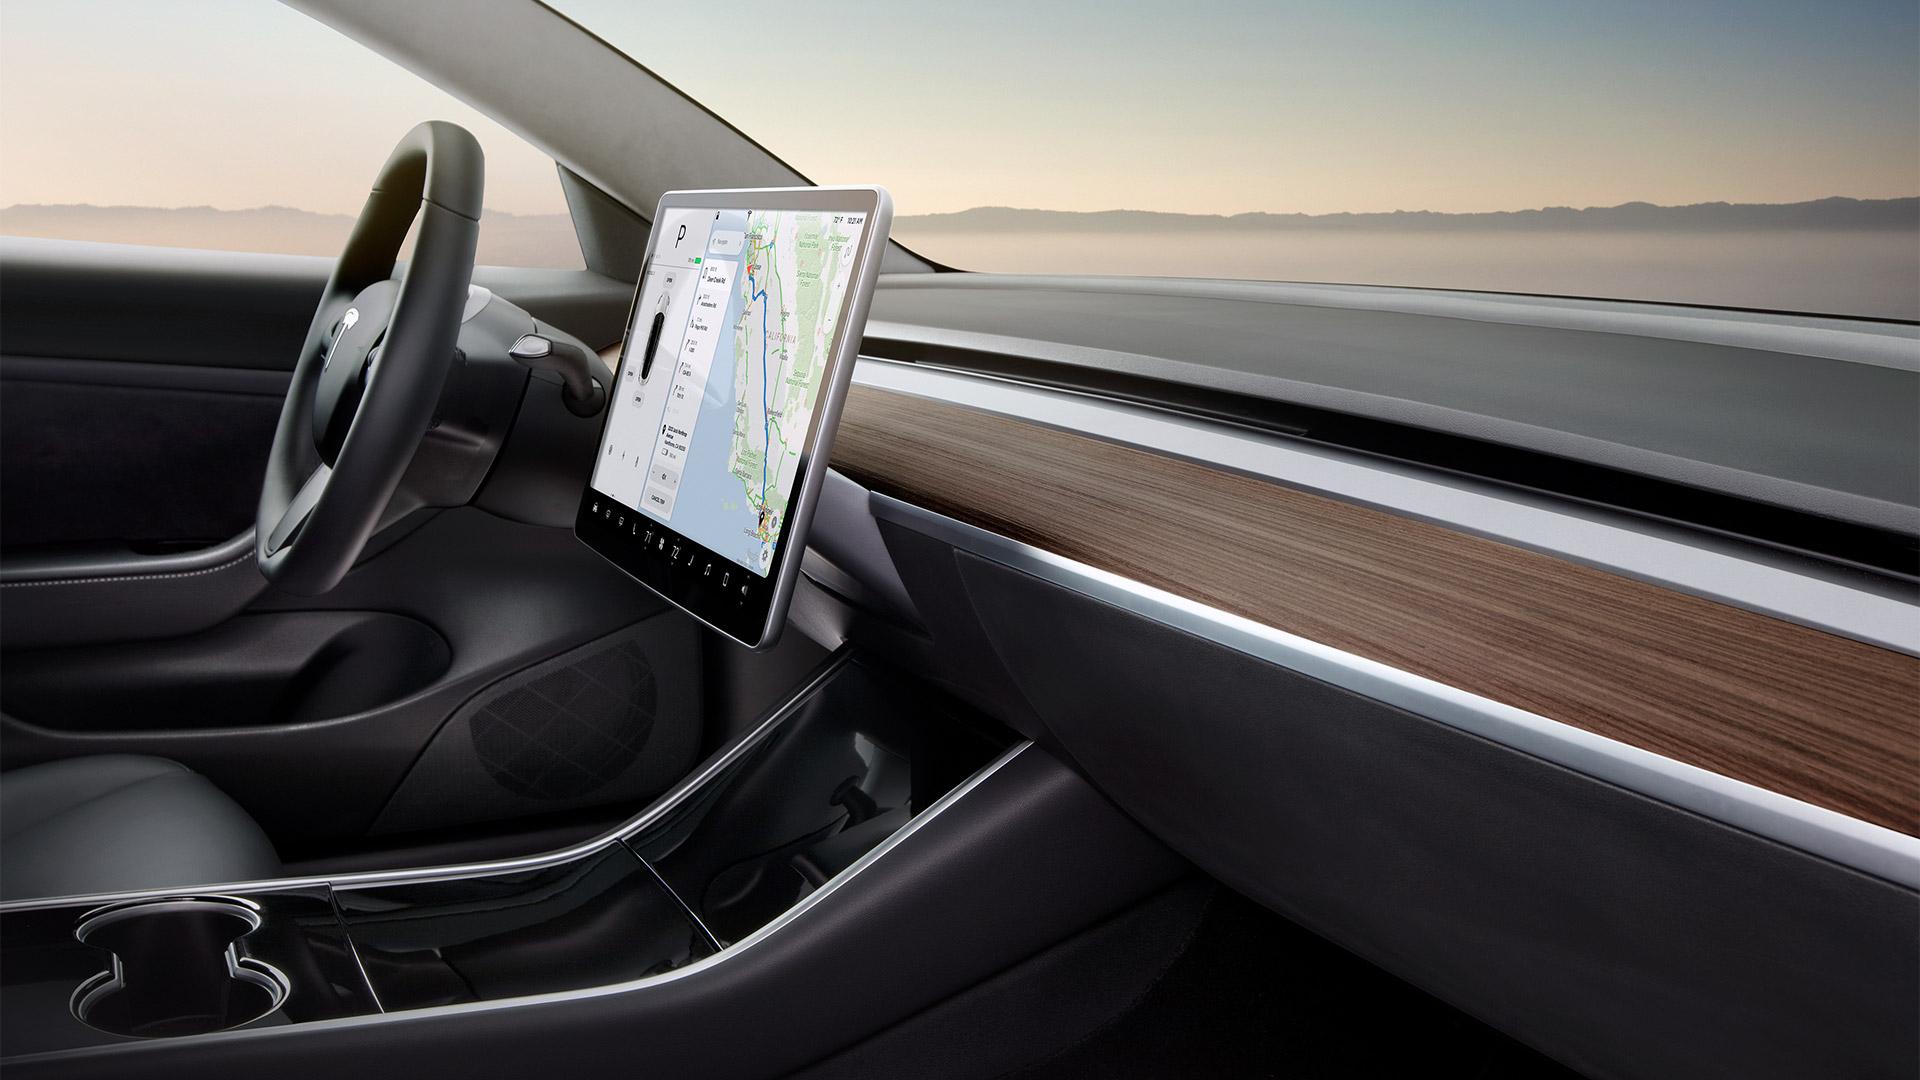 EV Comparison: Tesla Model 3 Versus Chevy Bolt - Tesla ...